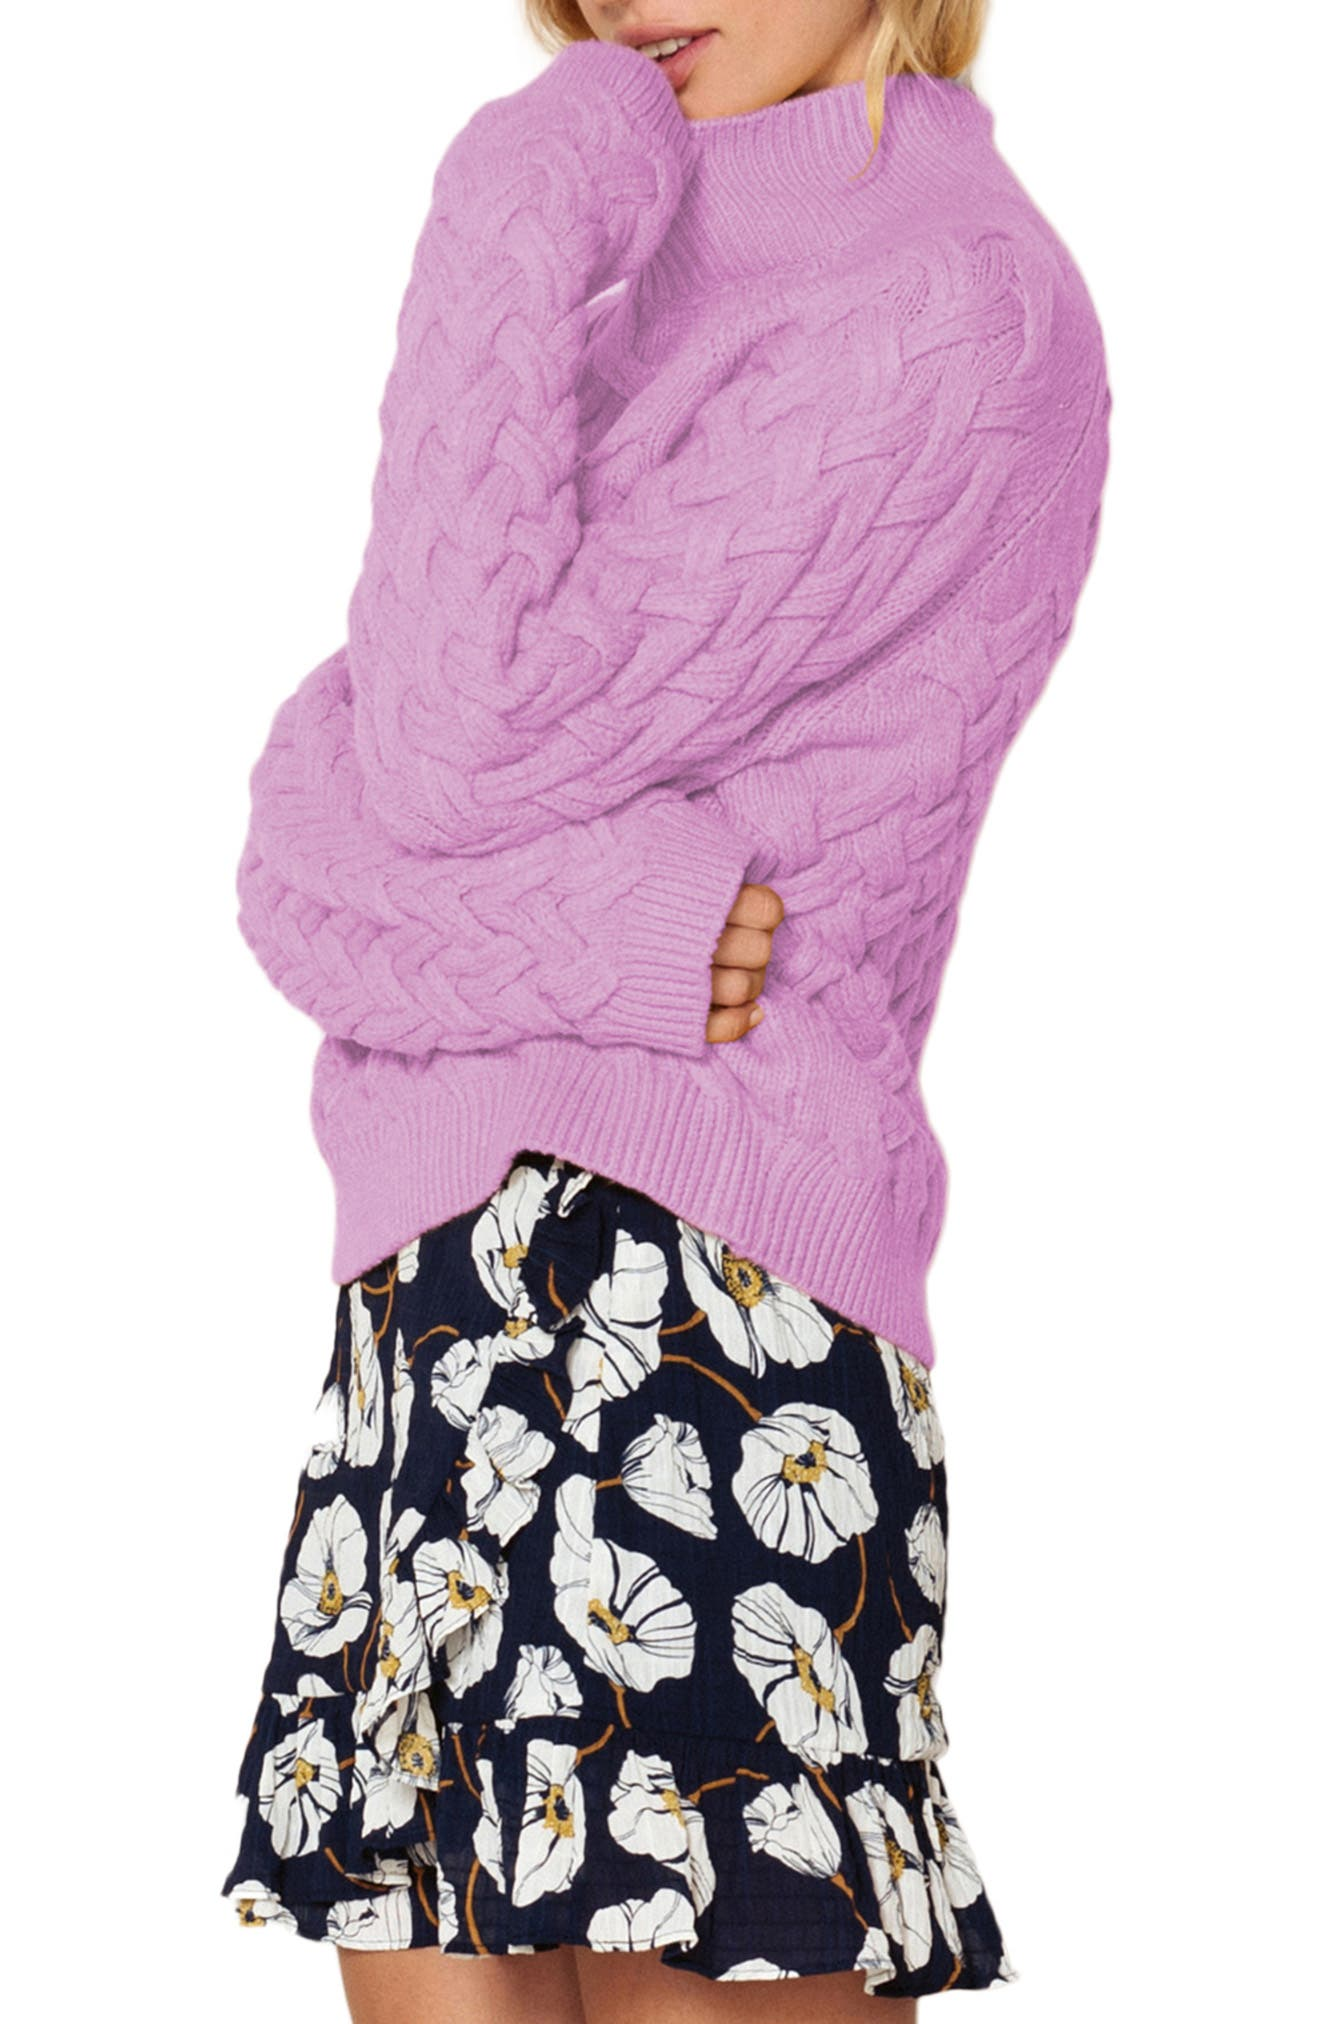 Adele Turtleneck Sweater,                             Alternate thumbnail 3, color,                             534